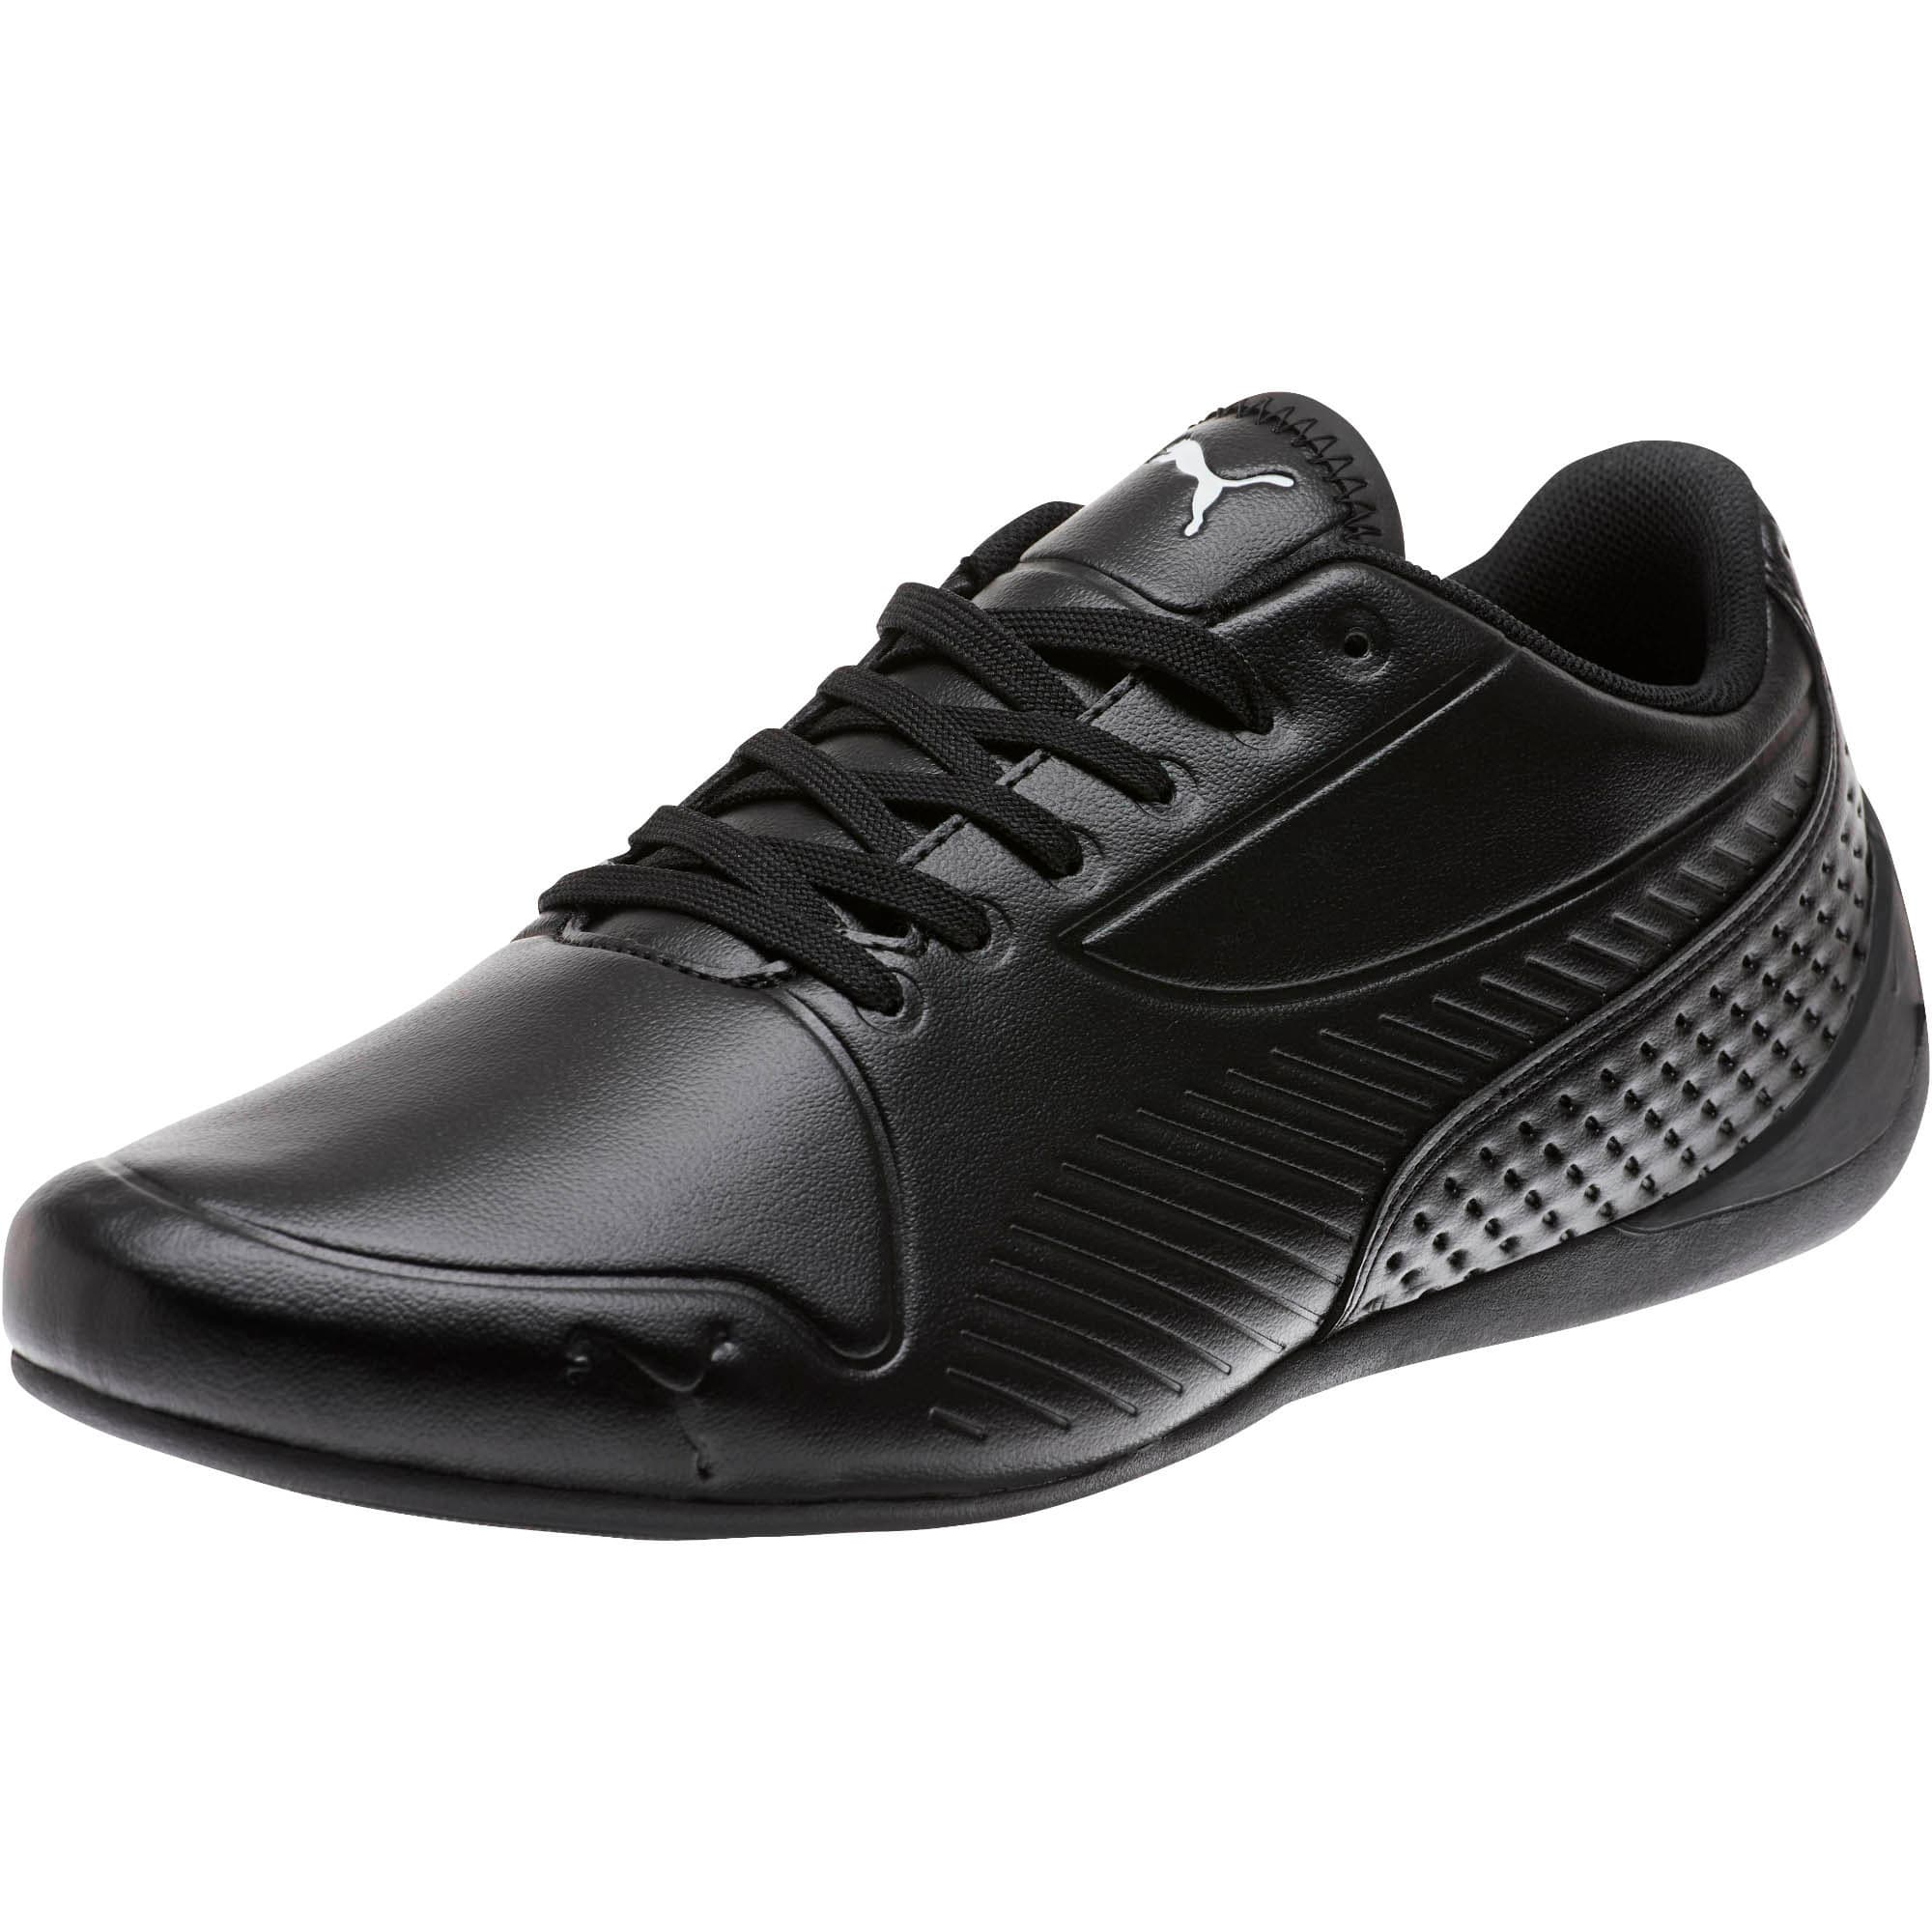 Thumbnail 1 of Drift Cat 7S Ultra Shoes, Puma Black-Puma Black, medium